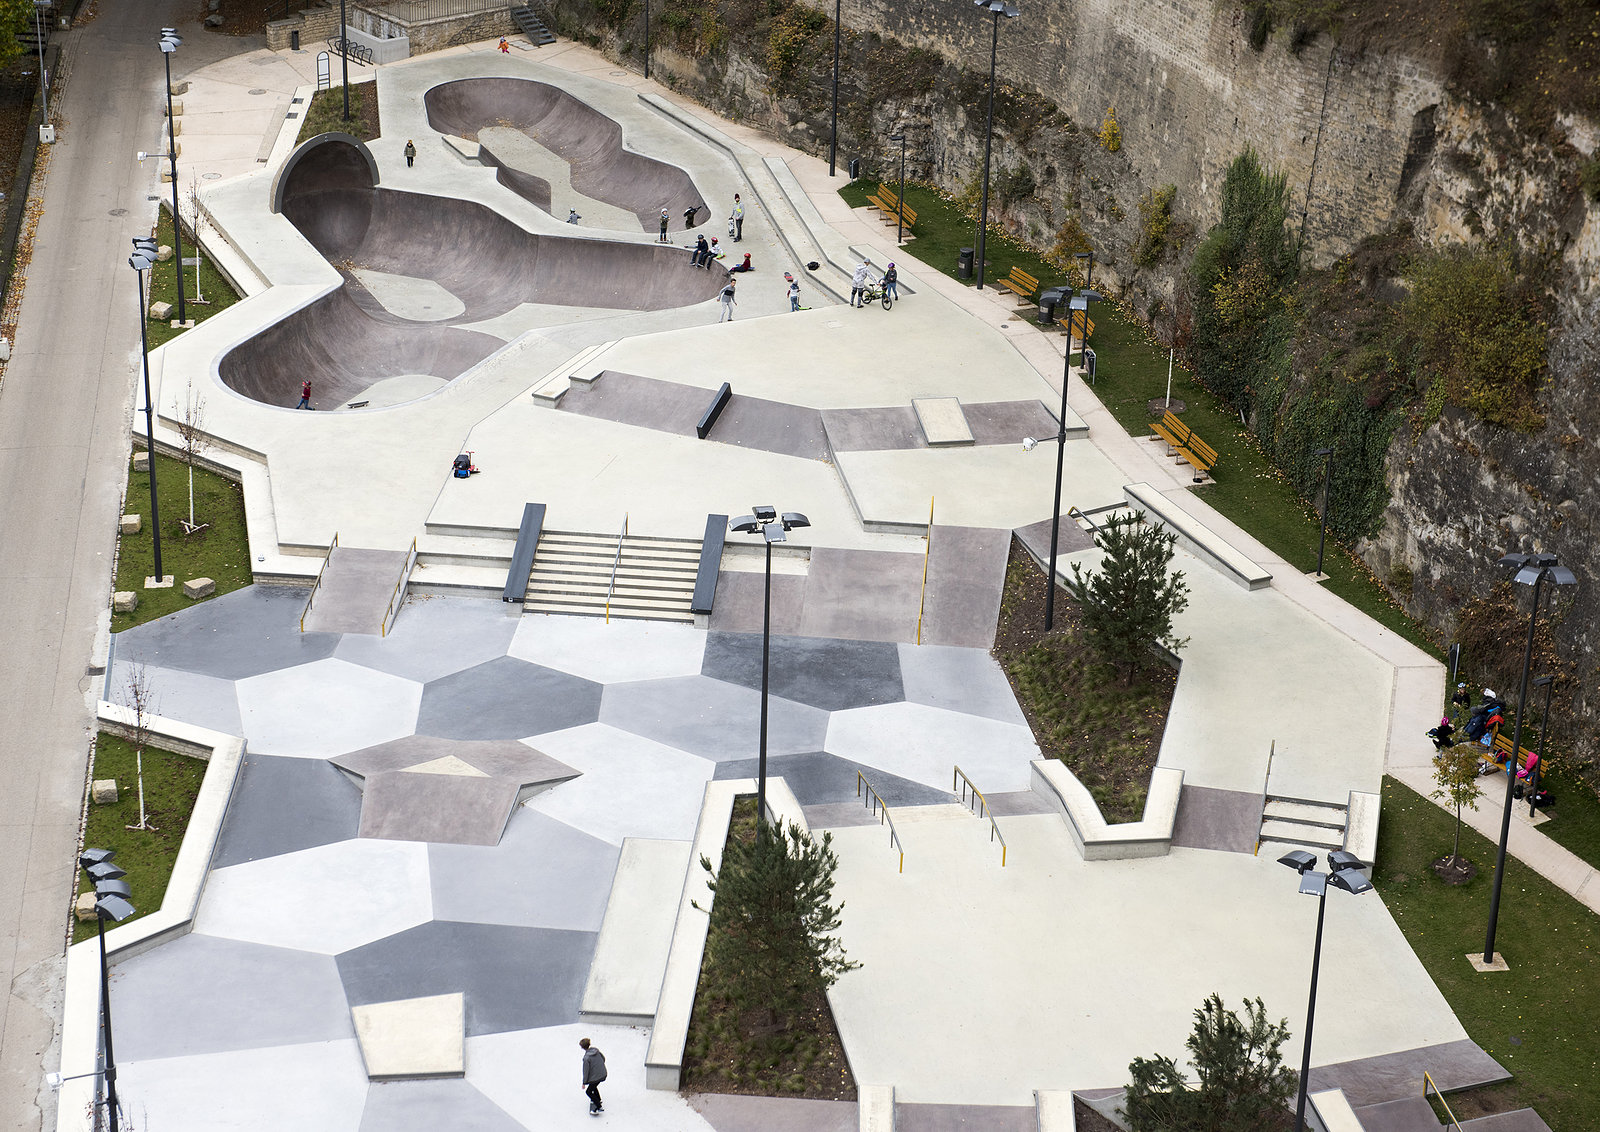 Skatepark Pettruss, Luxembourg